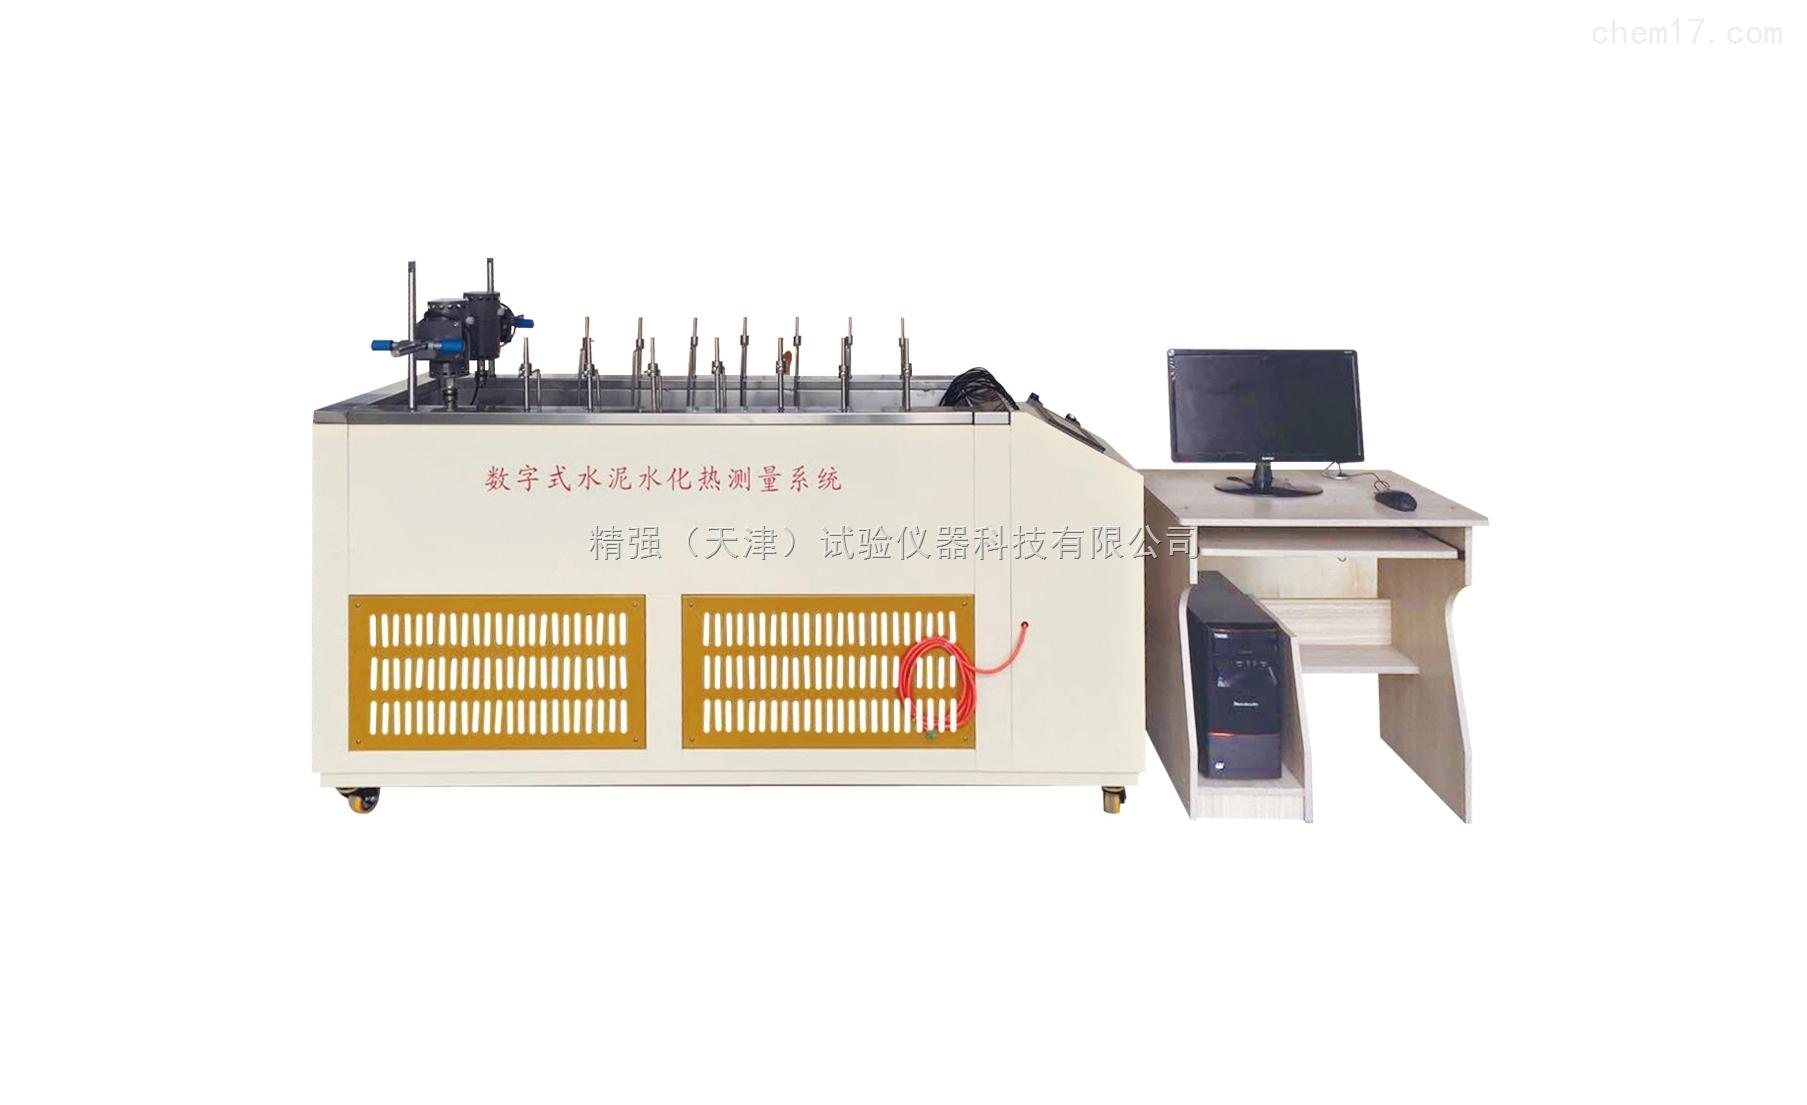 SHR-武汉水泥水化热测试仪